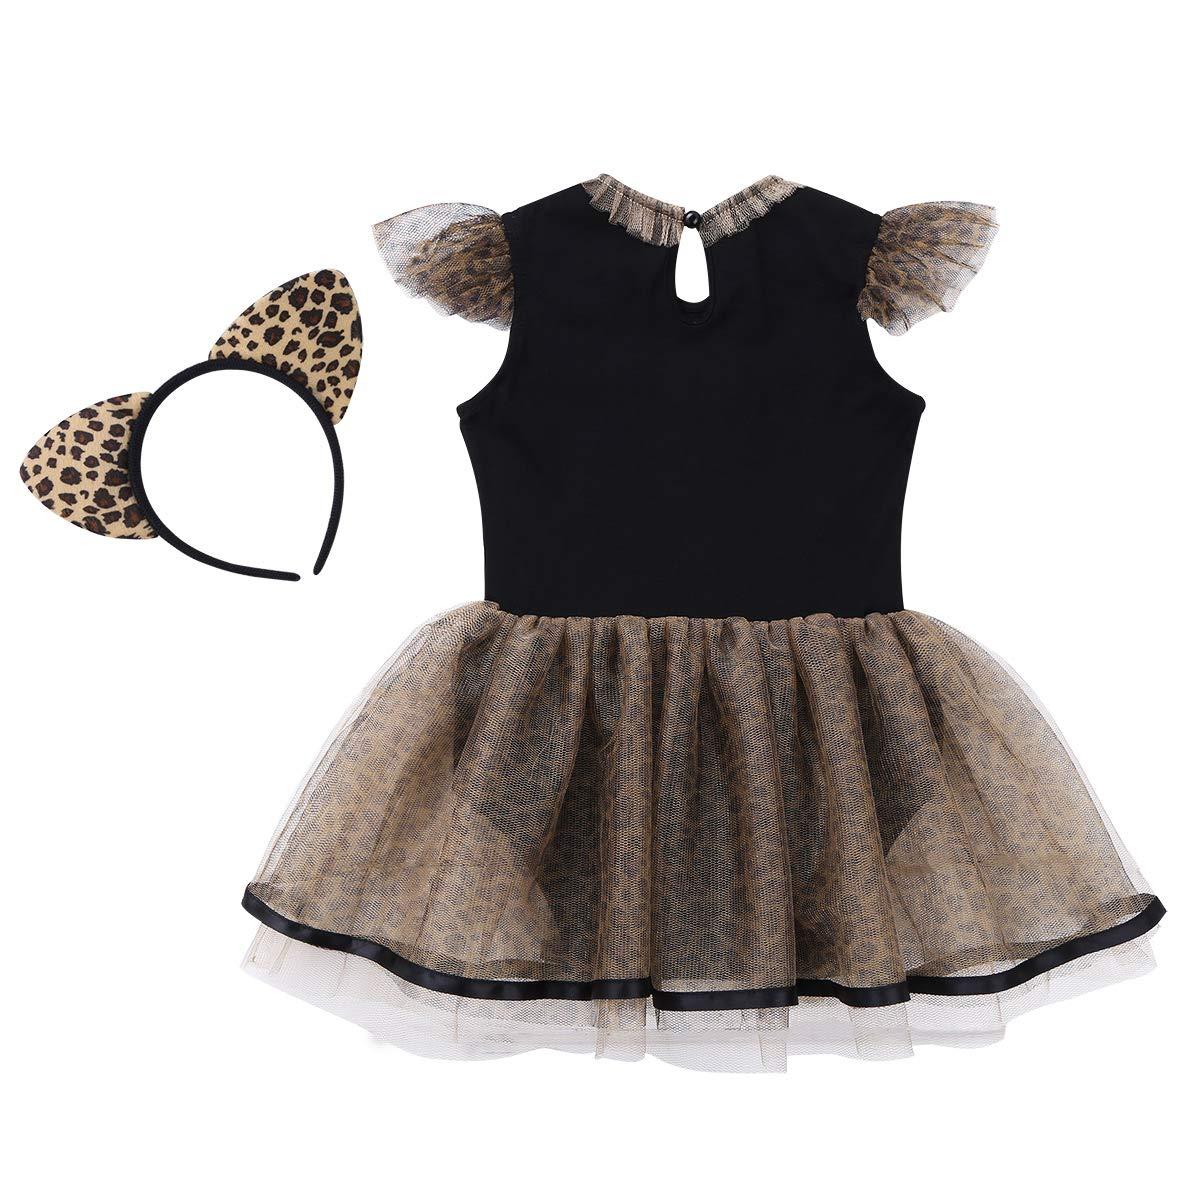 ranrann Vestido de Leopardo para Bebé Niña Disfraz de Gato Vestido de Princesa Infantil Manga con Volantes Body Traje Fiesta Carnaval con Diadema